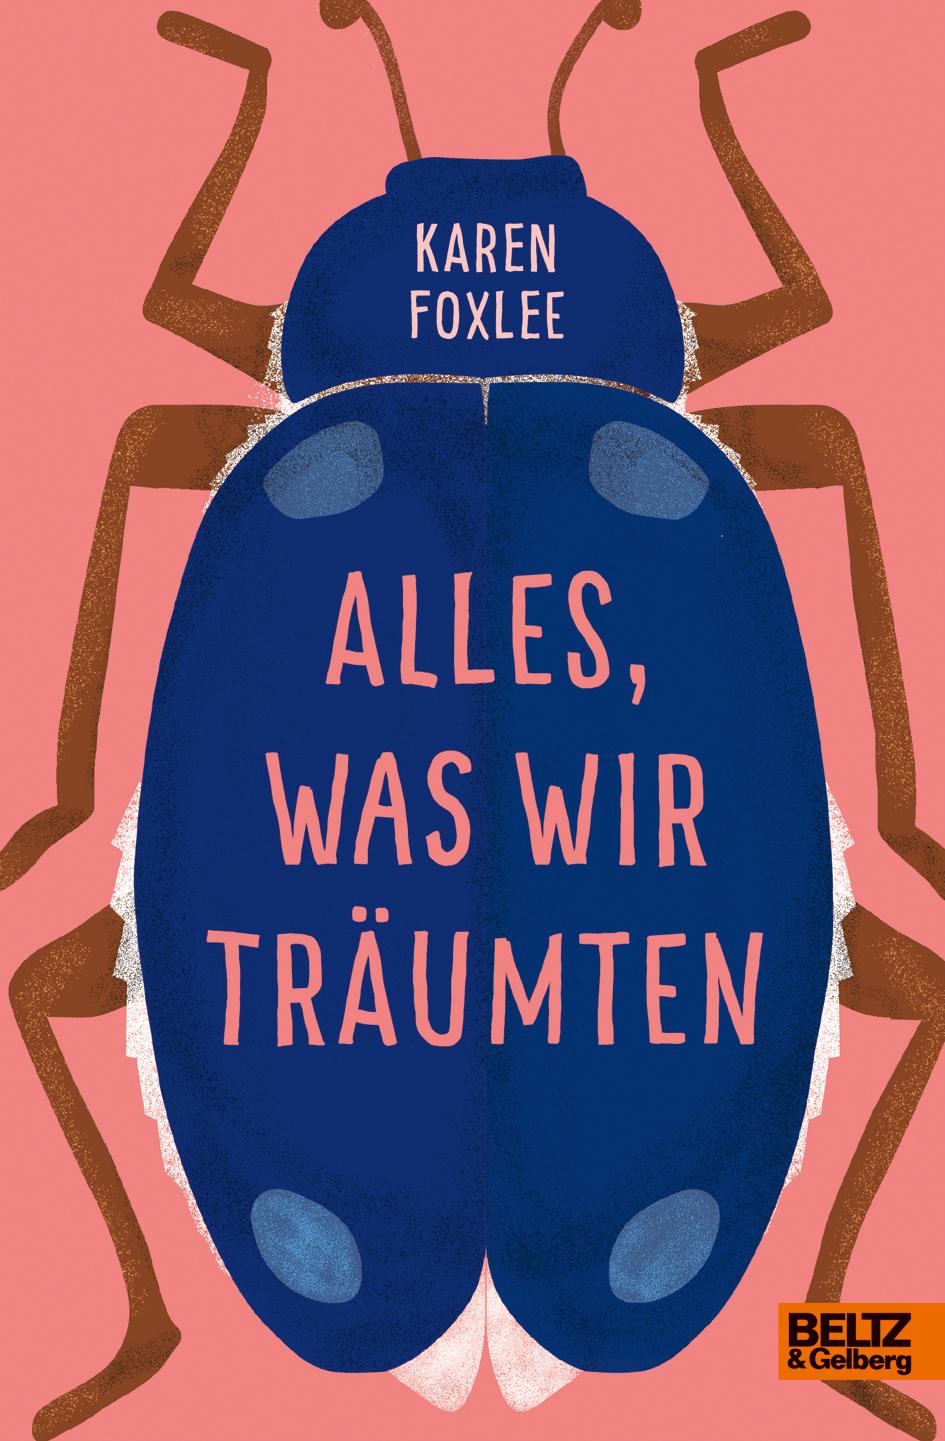 Foxlee_Alles_was_U1-U4.indd